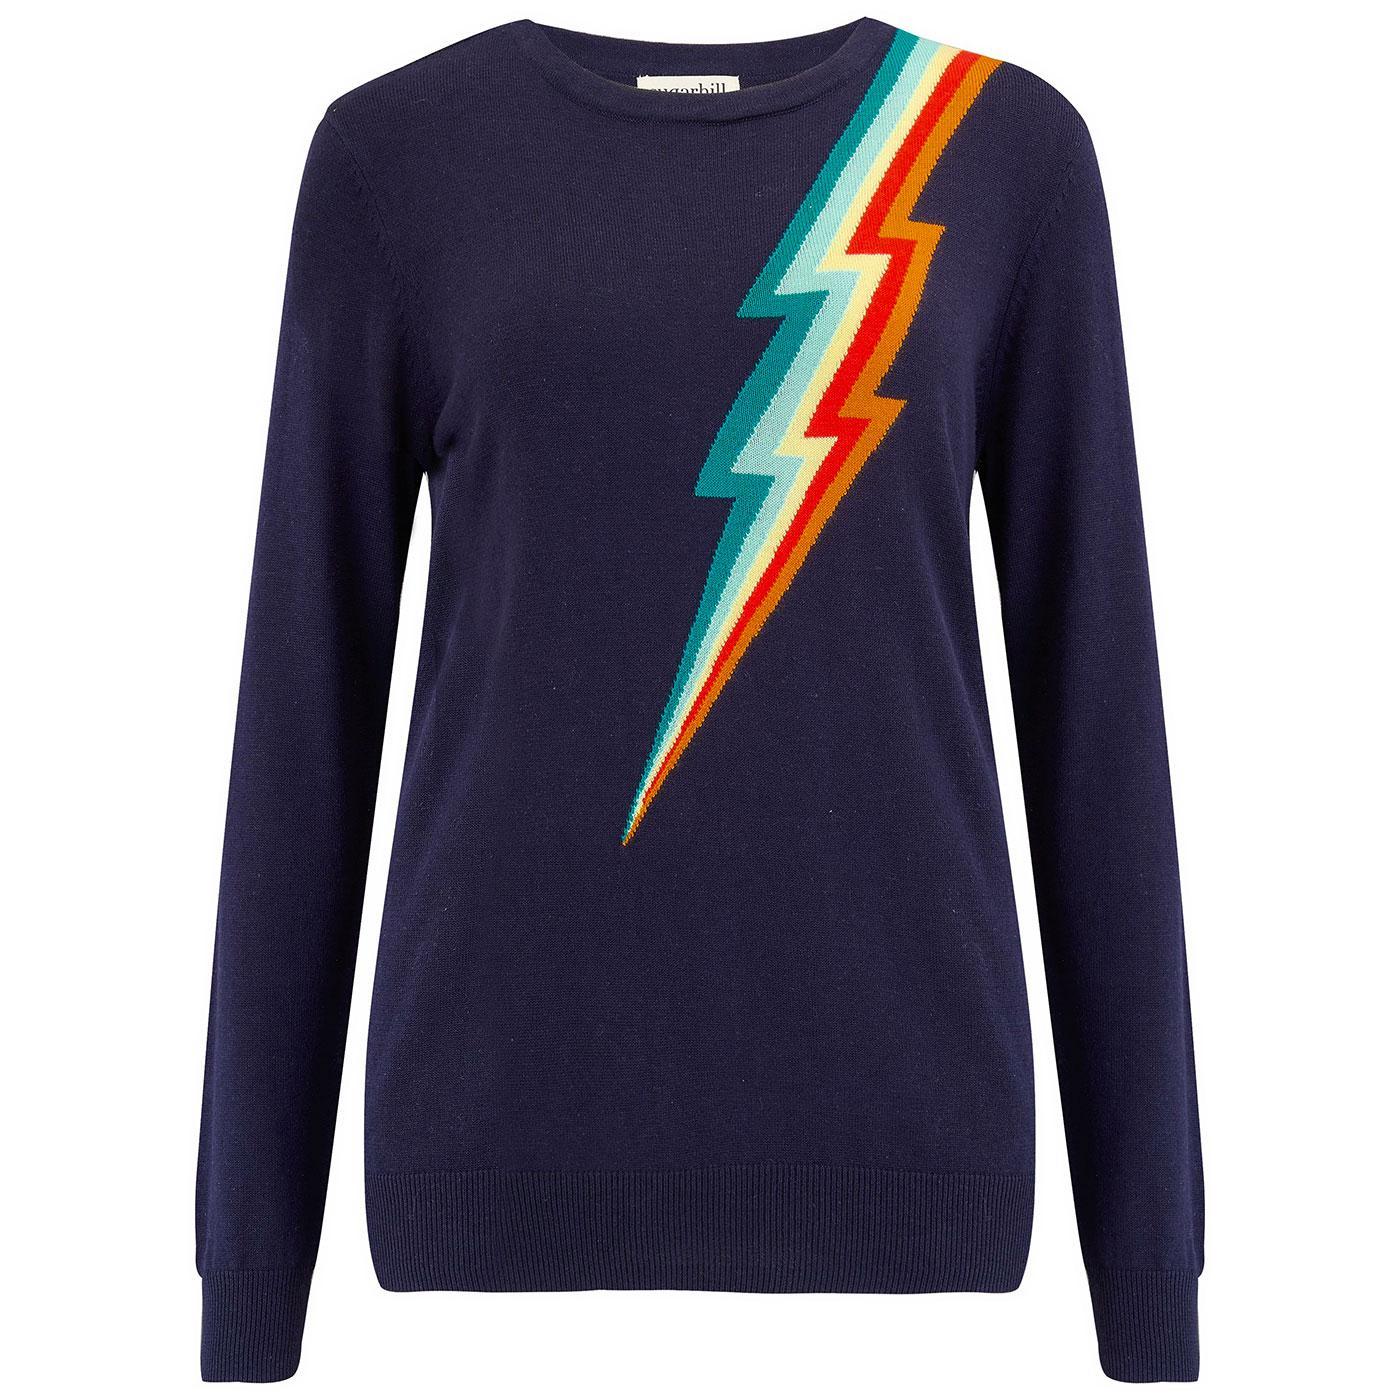 Rita SUGARHILL 70s Rainbow Lightning Flash Jumper